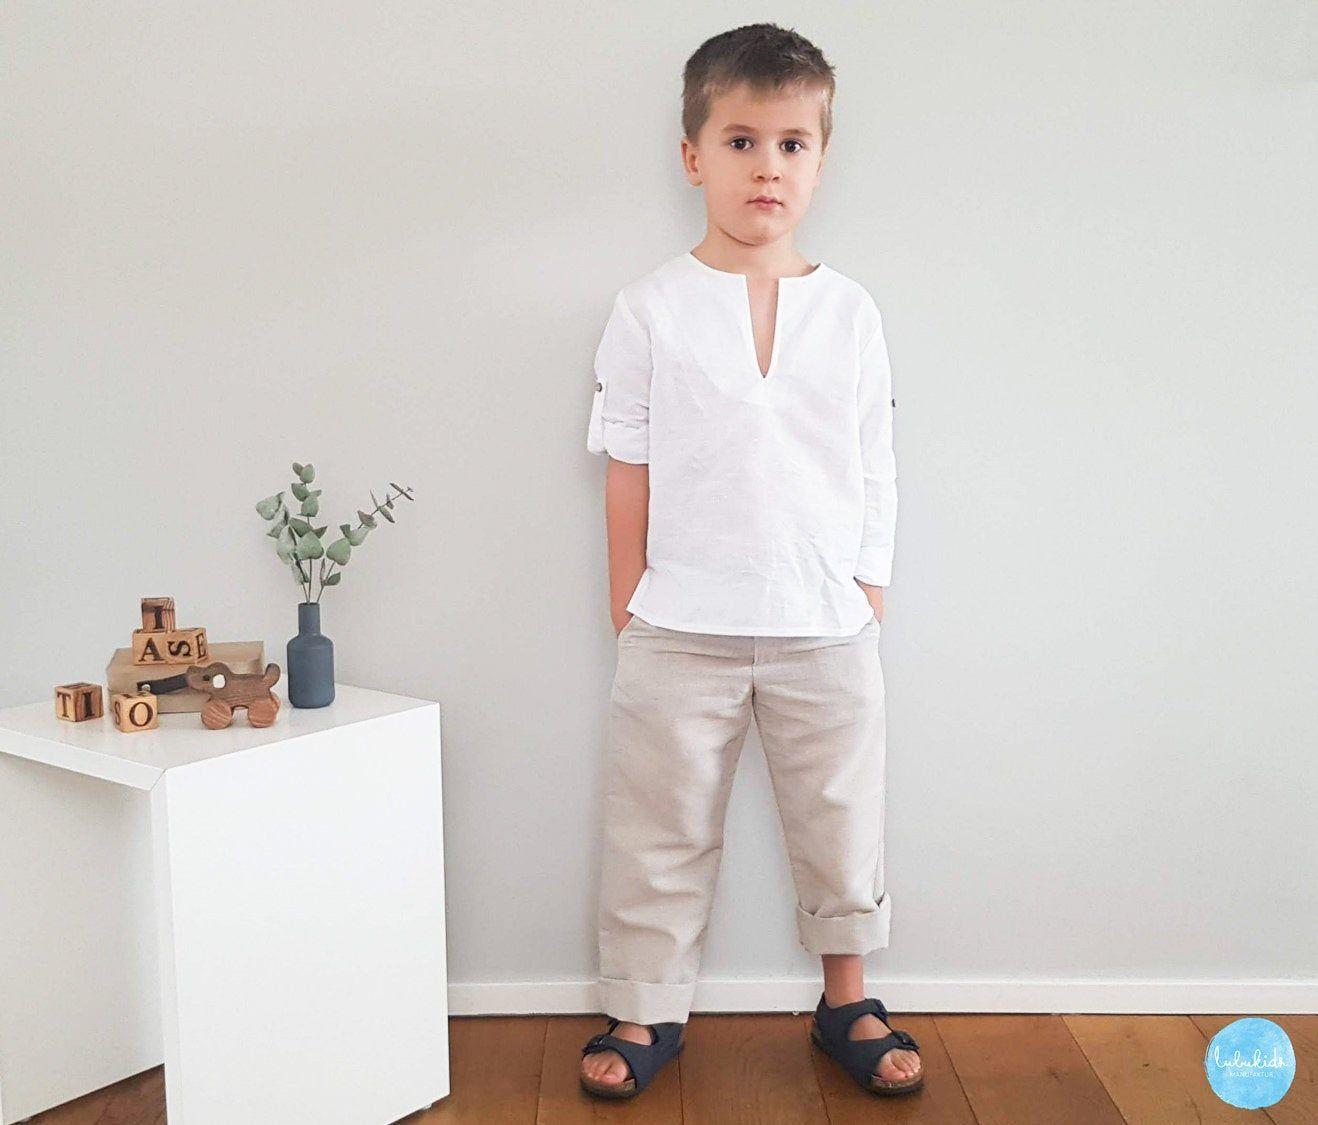 2 Teiliges Jungen Outfit Lange Hose Weisses Hemd Zum Etsy Boy Outfits Long Linen Pants Kids Suits